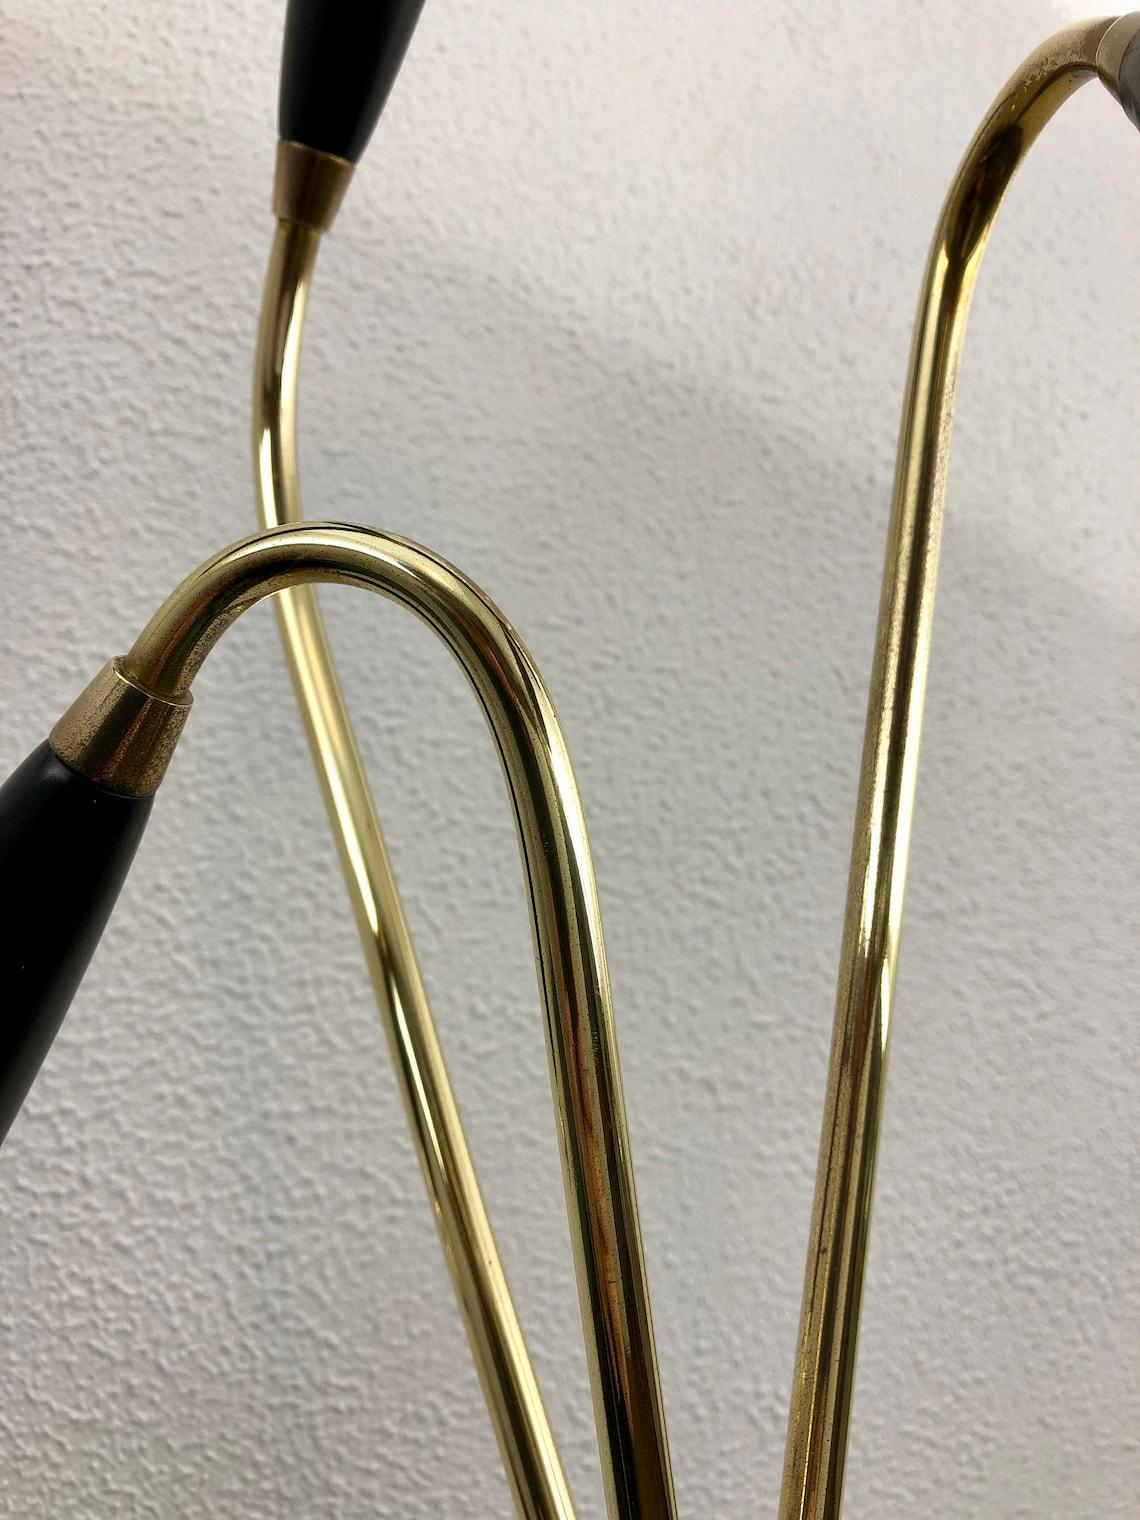 Brass Tripod Table 3 Light - 60's Modern Lamp - Mid Century - Eclairage